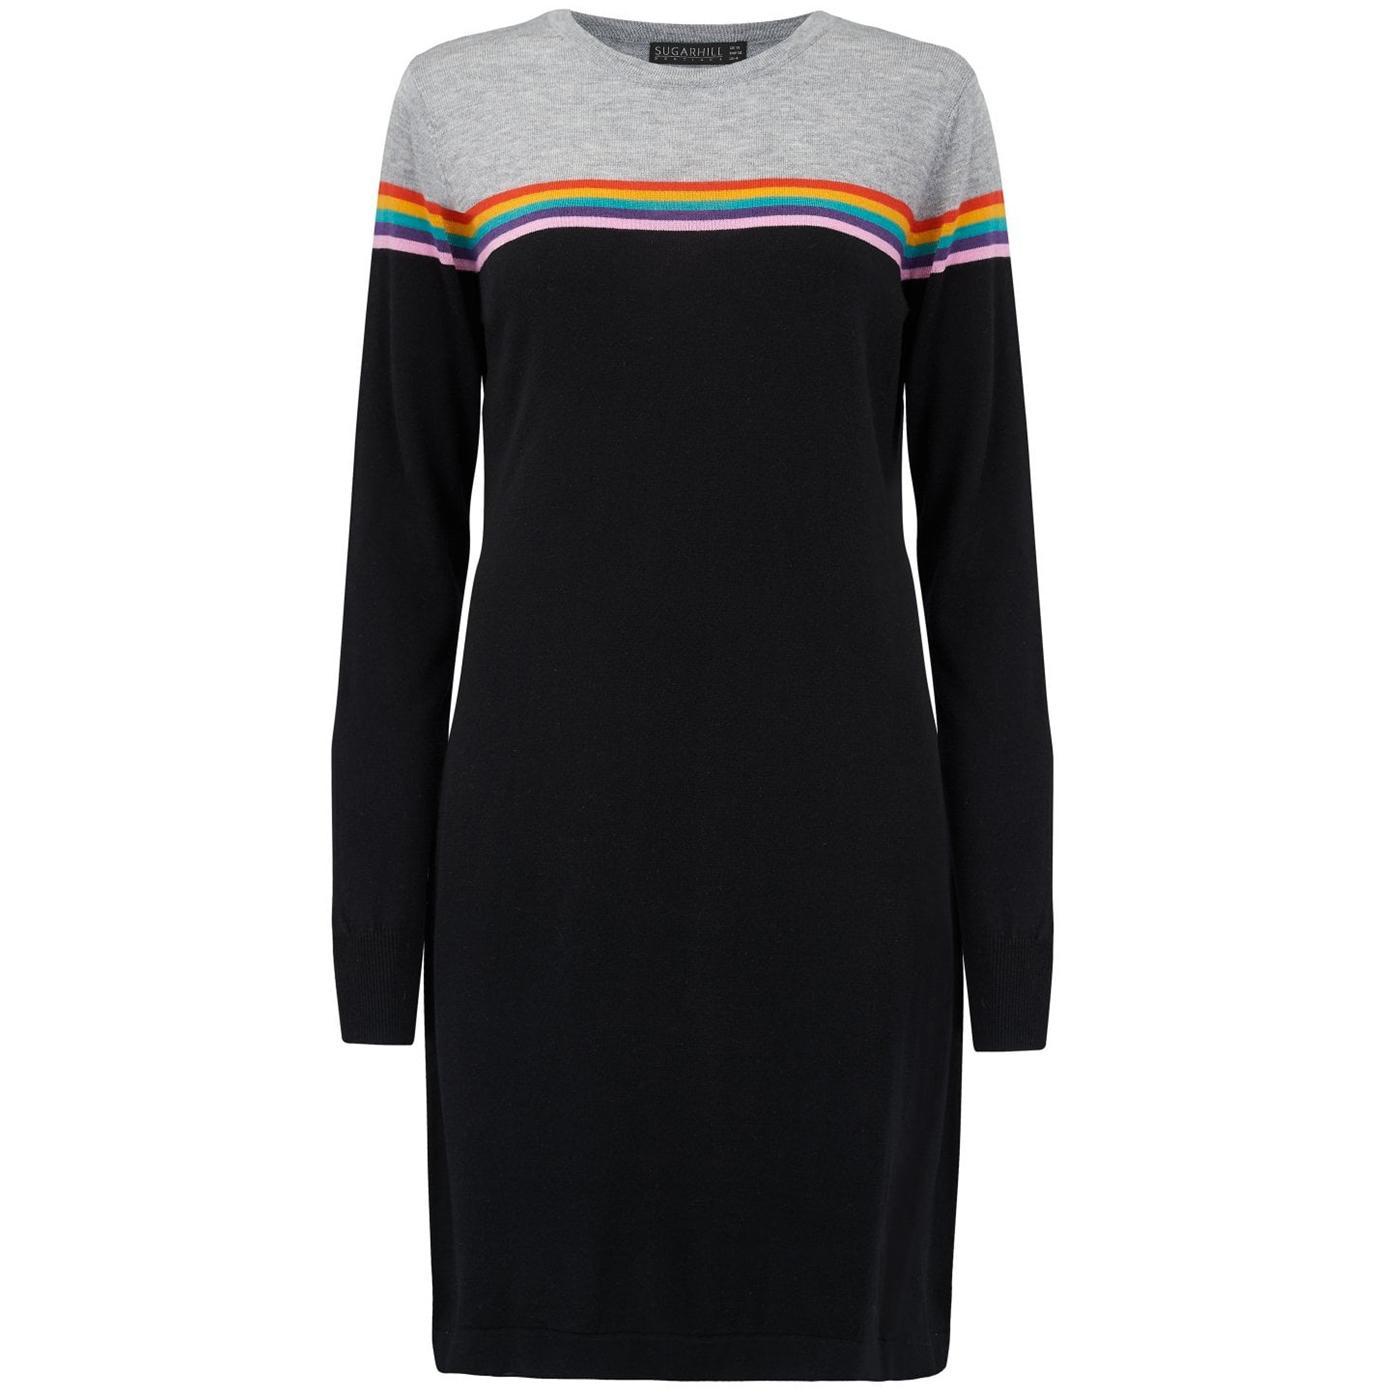 Evie Rainbow SUGARHILL BOUTIQUE Knit Dress Black